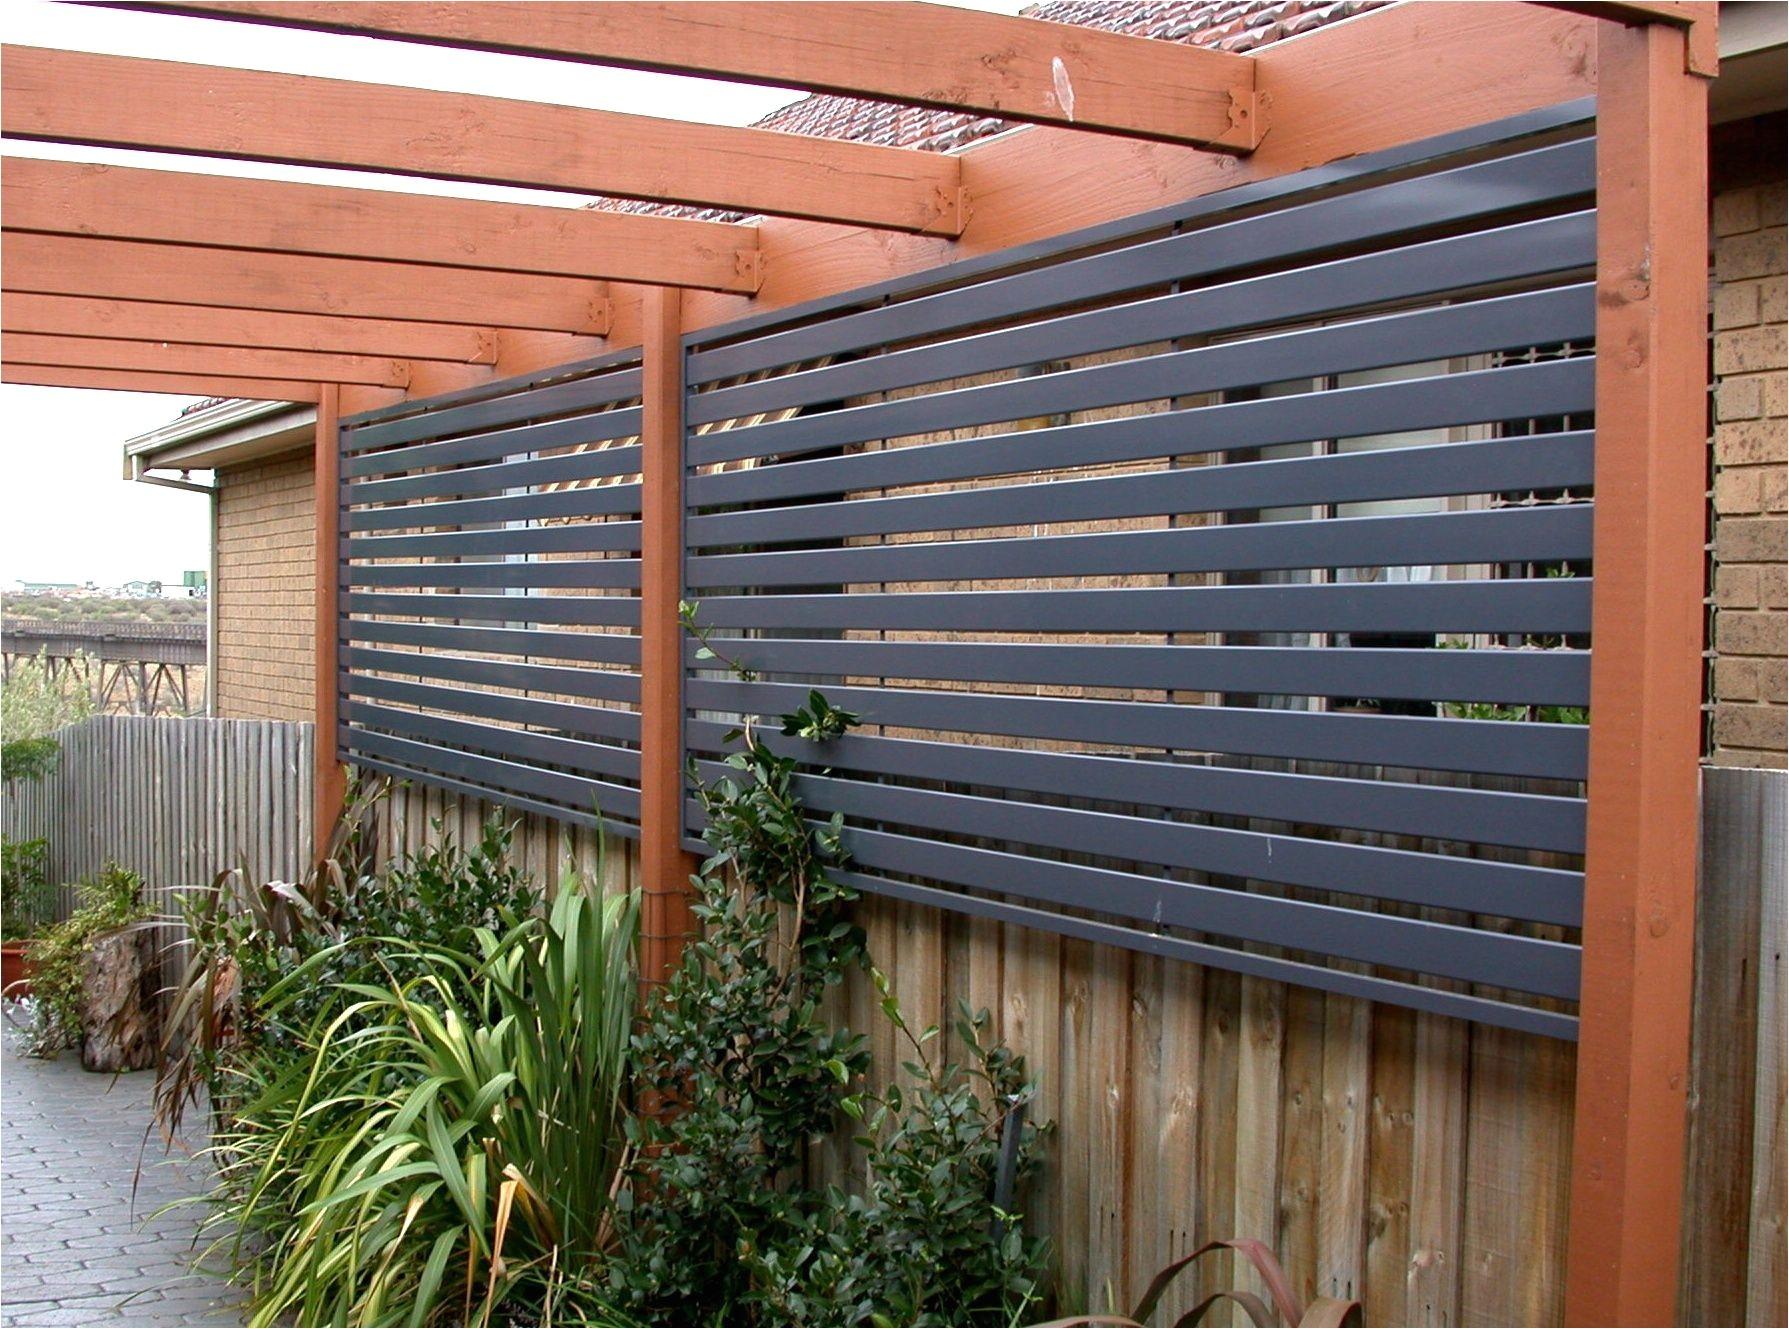 as robert frost wrote good fences make good neighbors